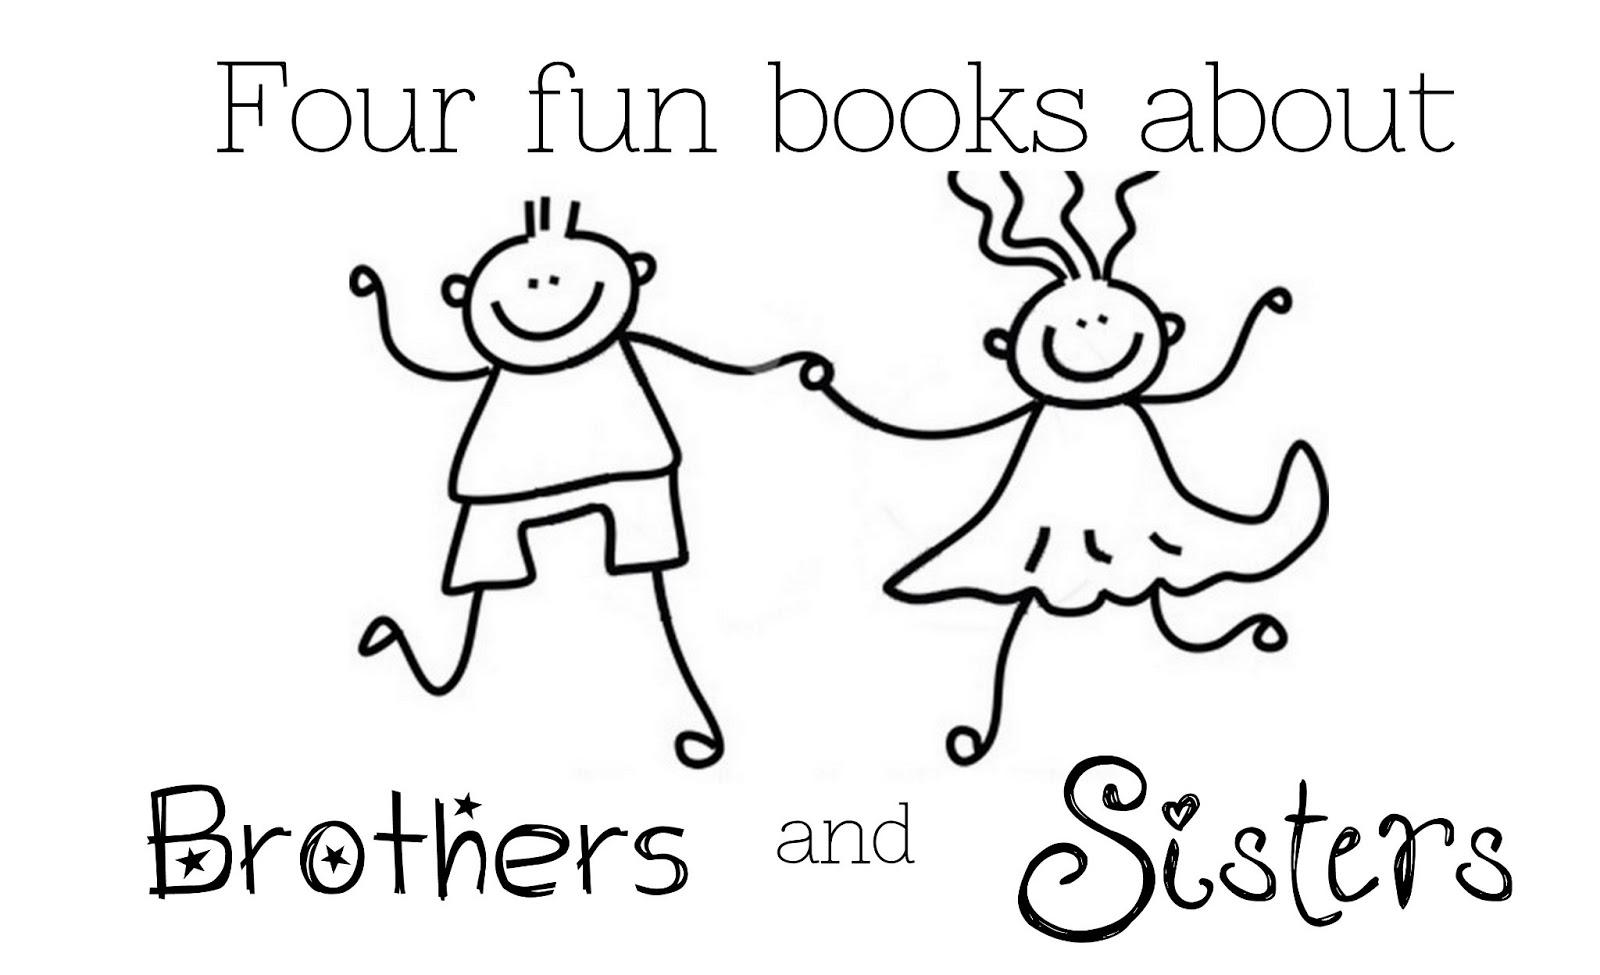 Serving Pink Lemonade Book Reviews Big SistersLittle Brothers